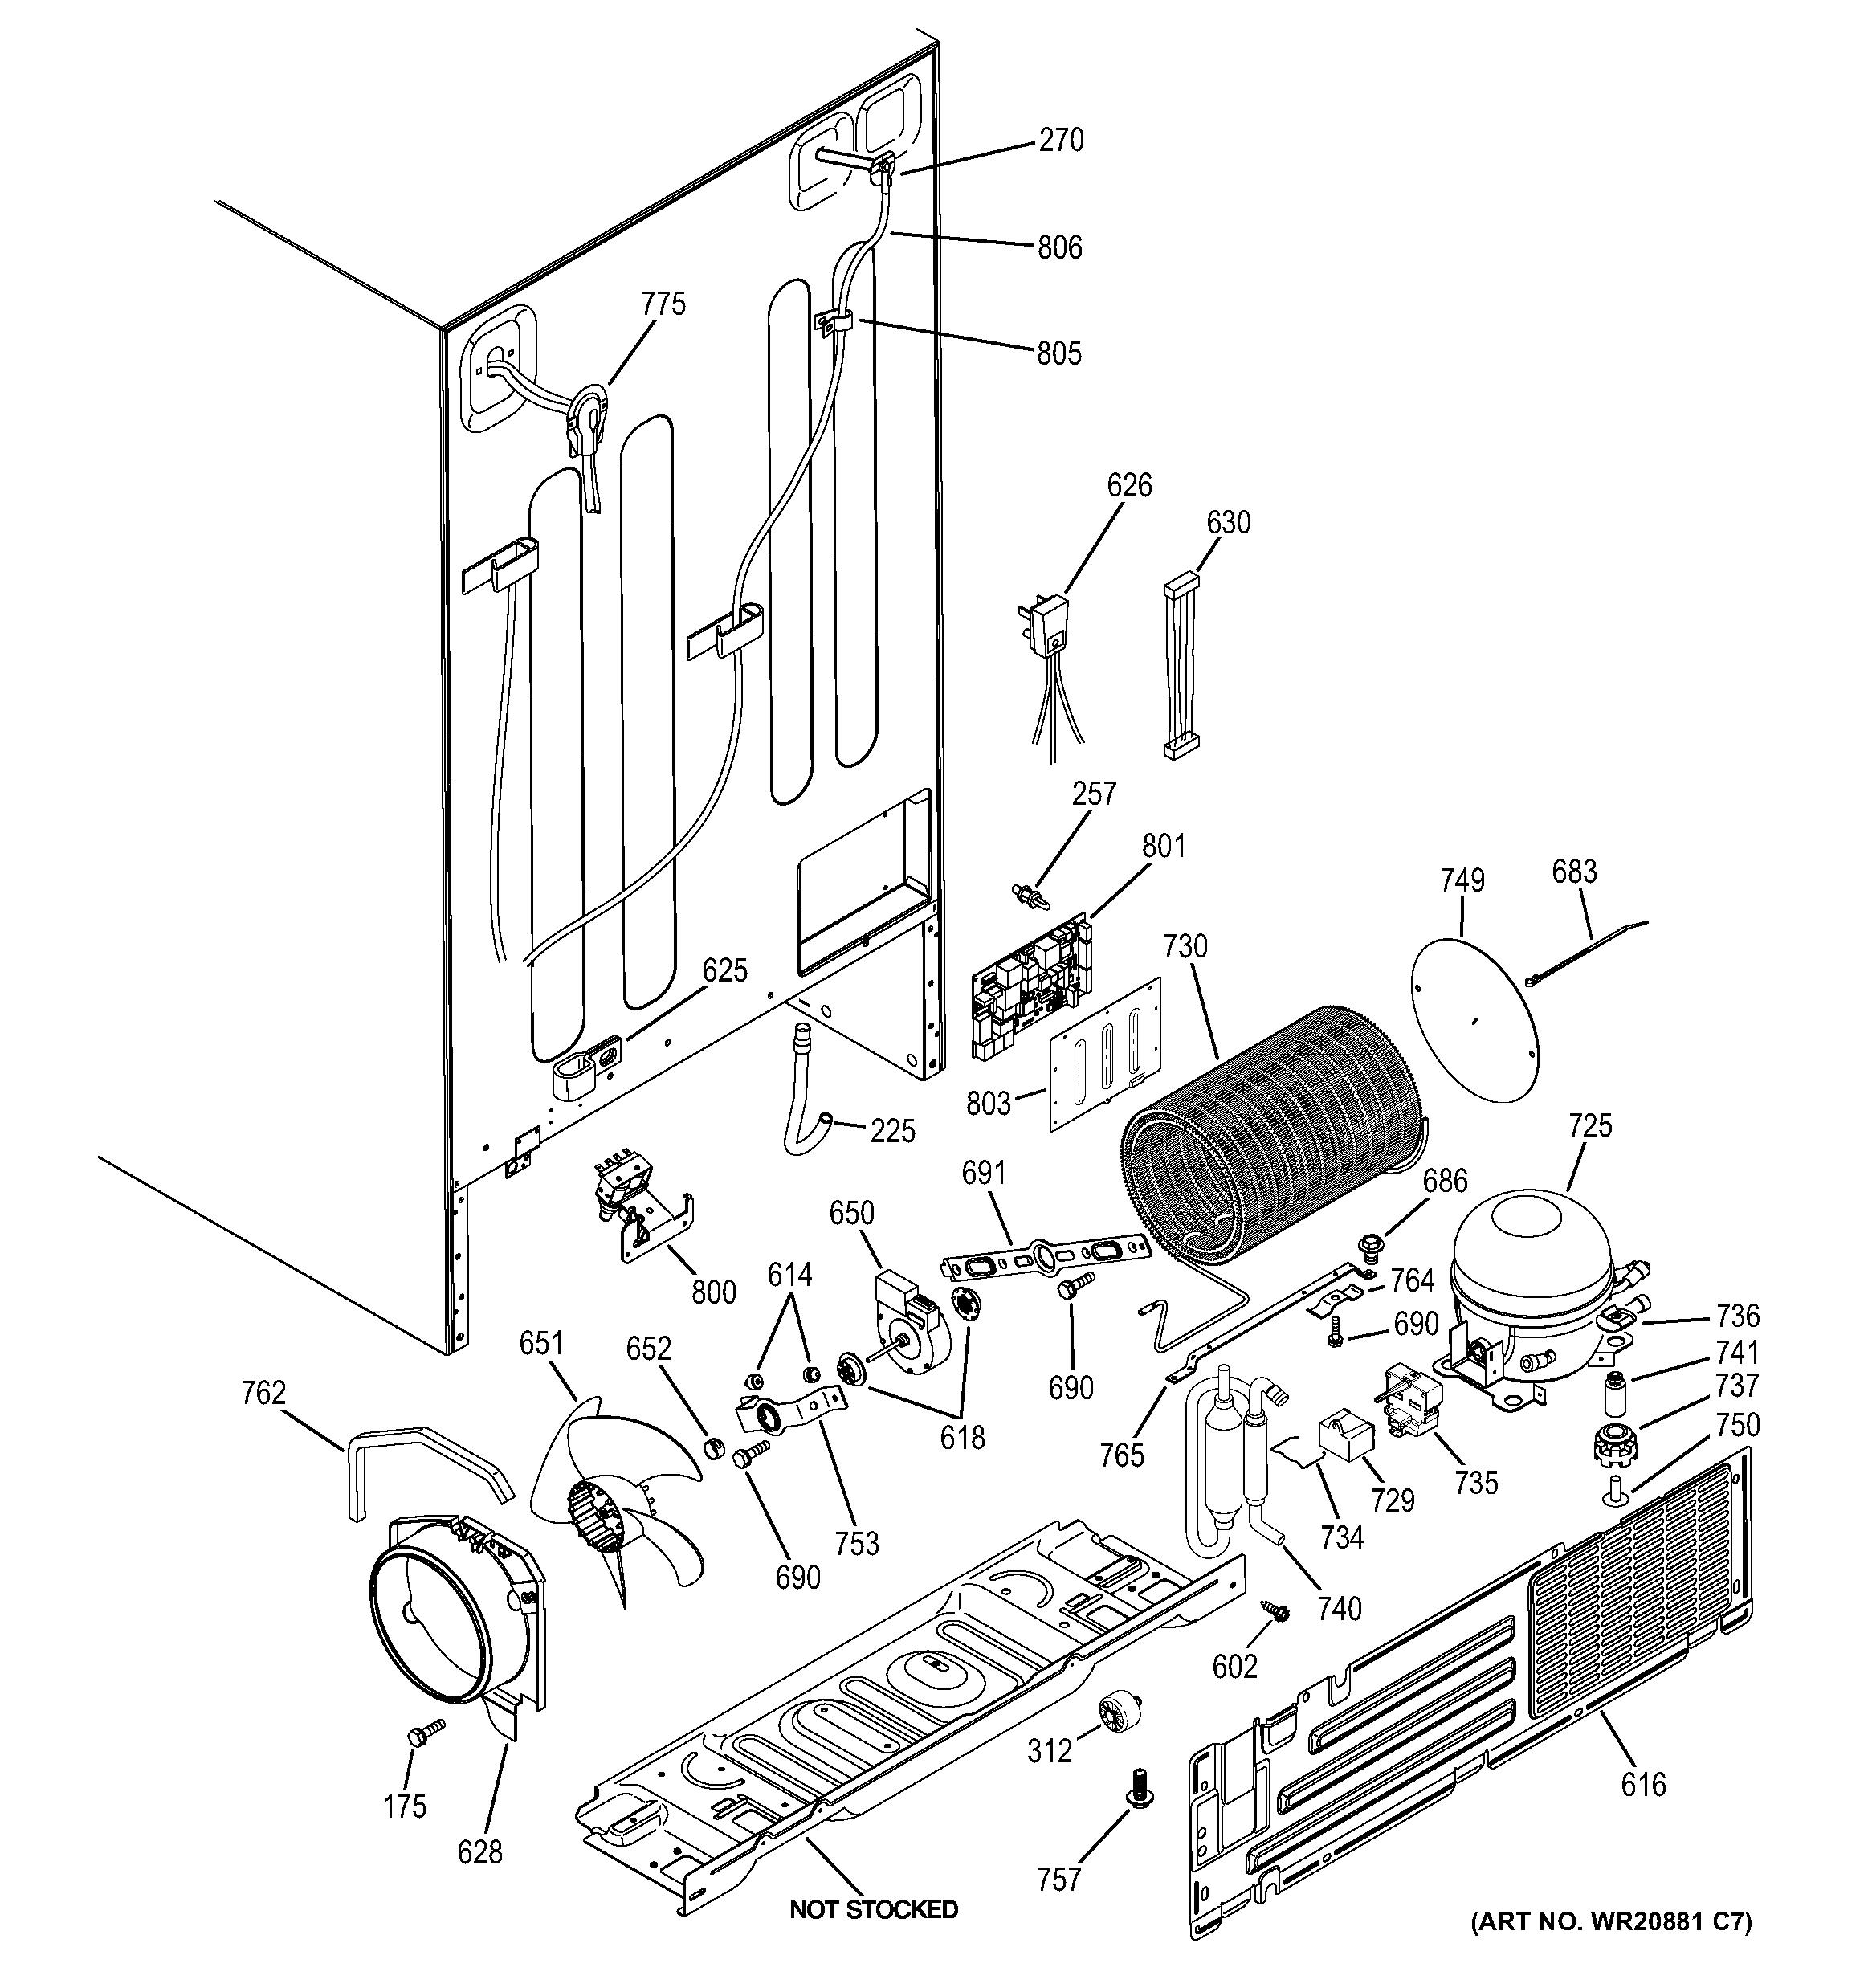 Ge Refrigerator Wiring Diagram 1965 - 2002 Frontier Engine Diagram -  loader.tukune.jeanjaures37.fr | Ge Profile Wiring Schematic |  | Wiring Diagram Resource